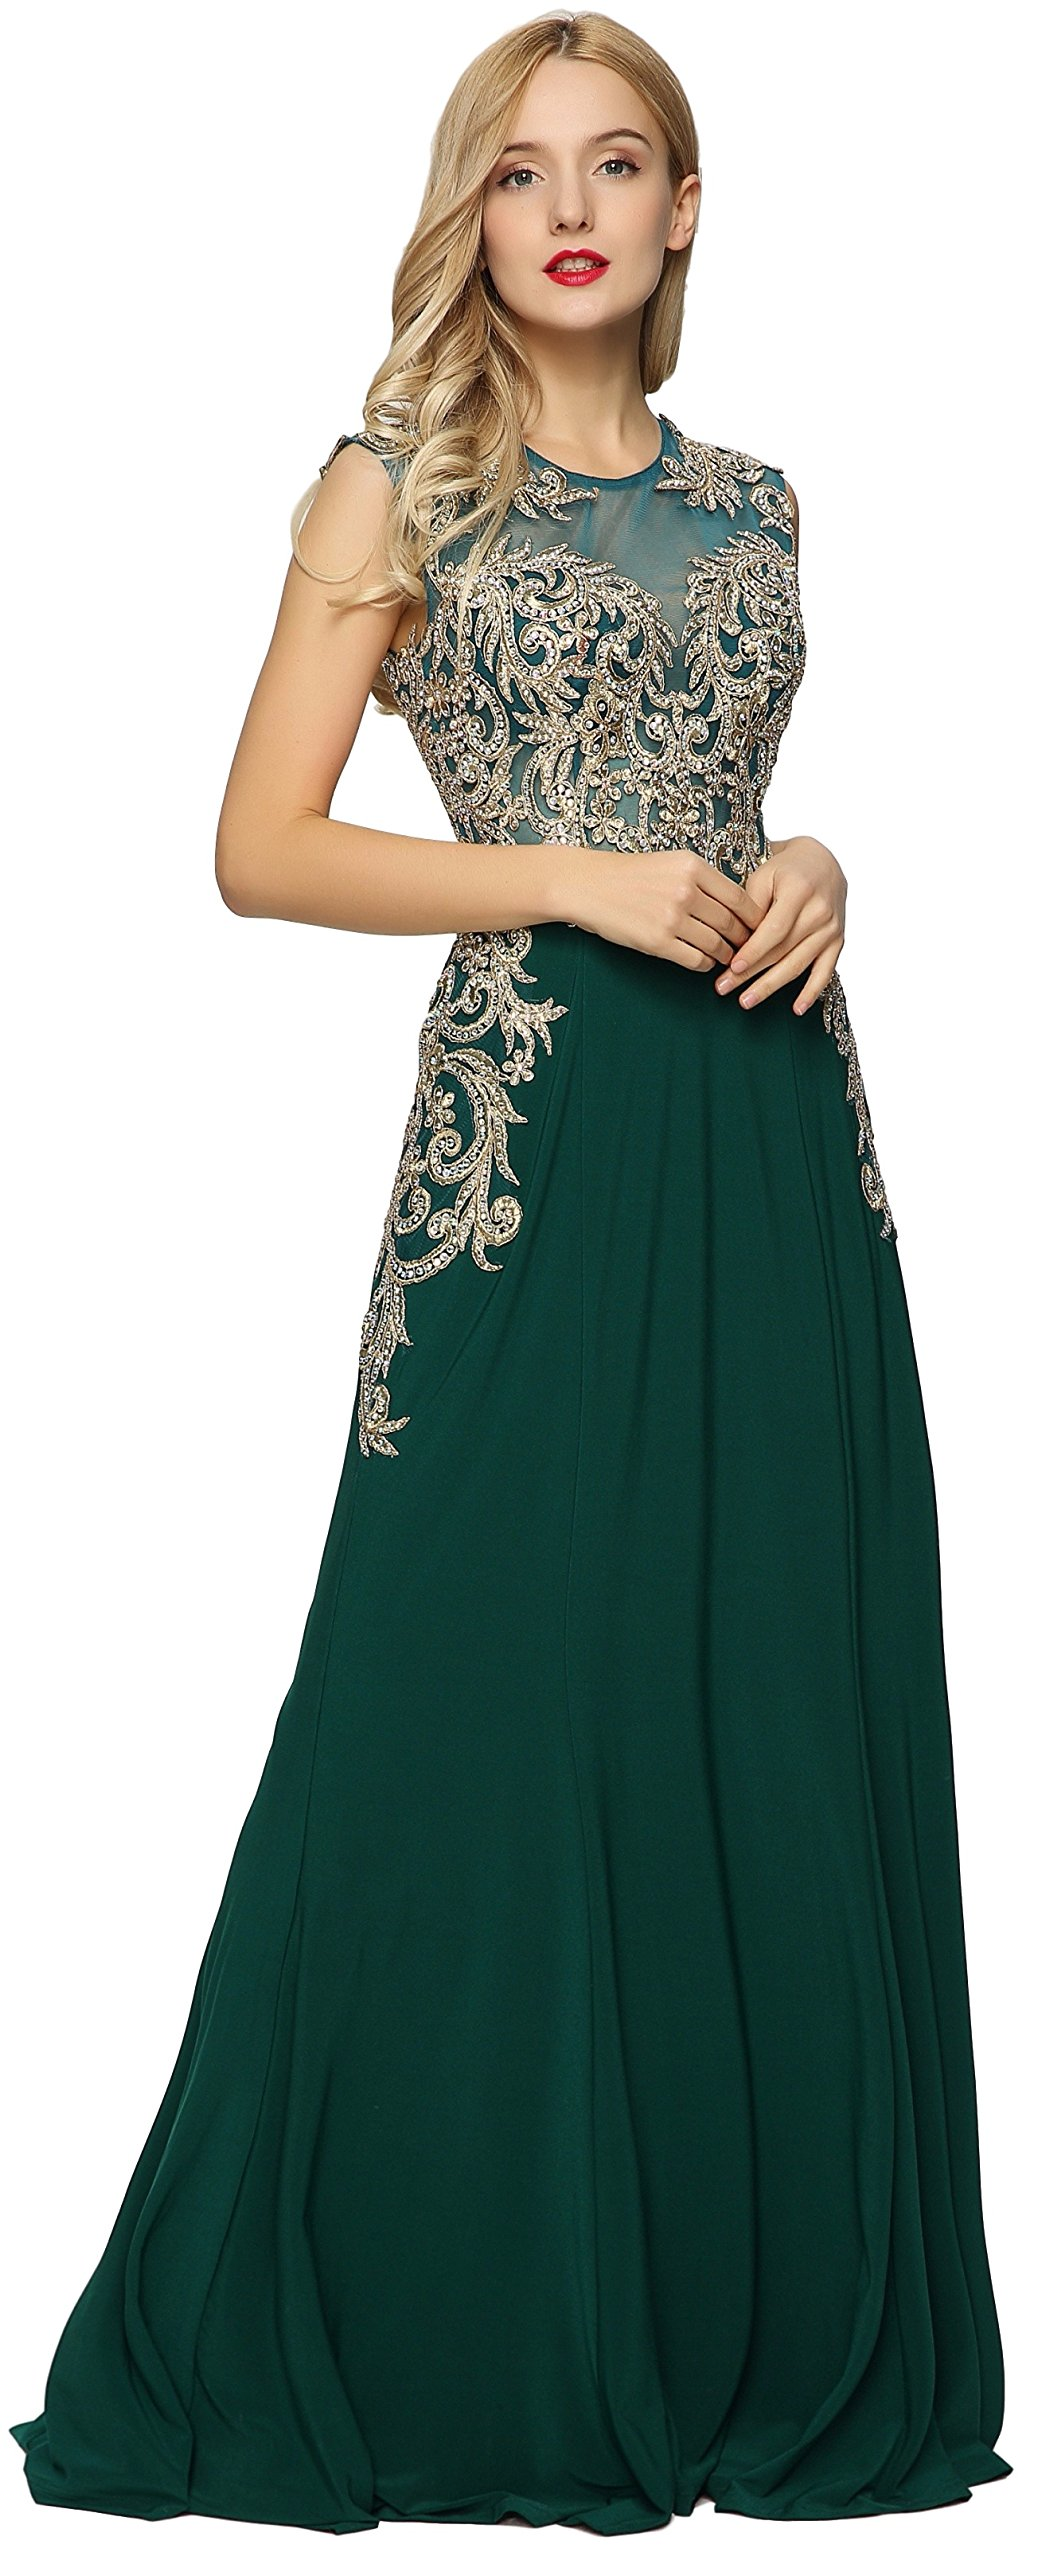 Meier Women's Sleeveless Gold Embroidery Evening Formal Dress Green size 16 by Meier